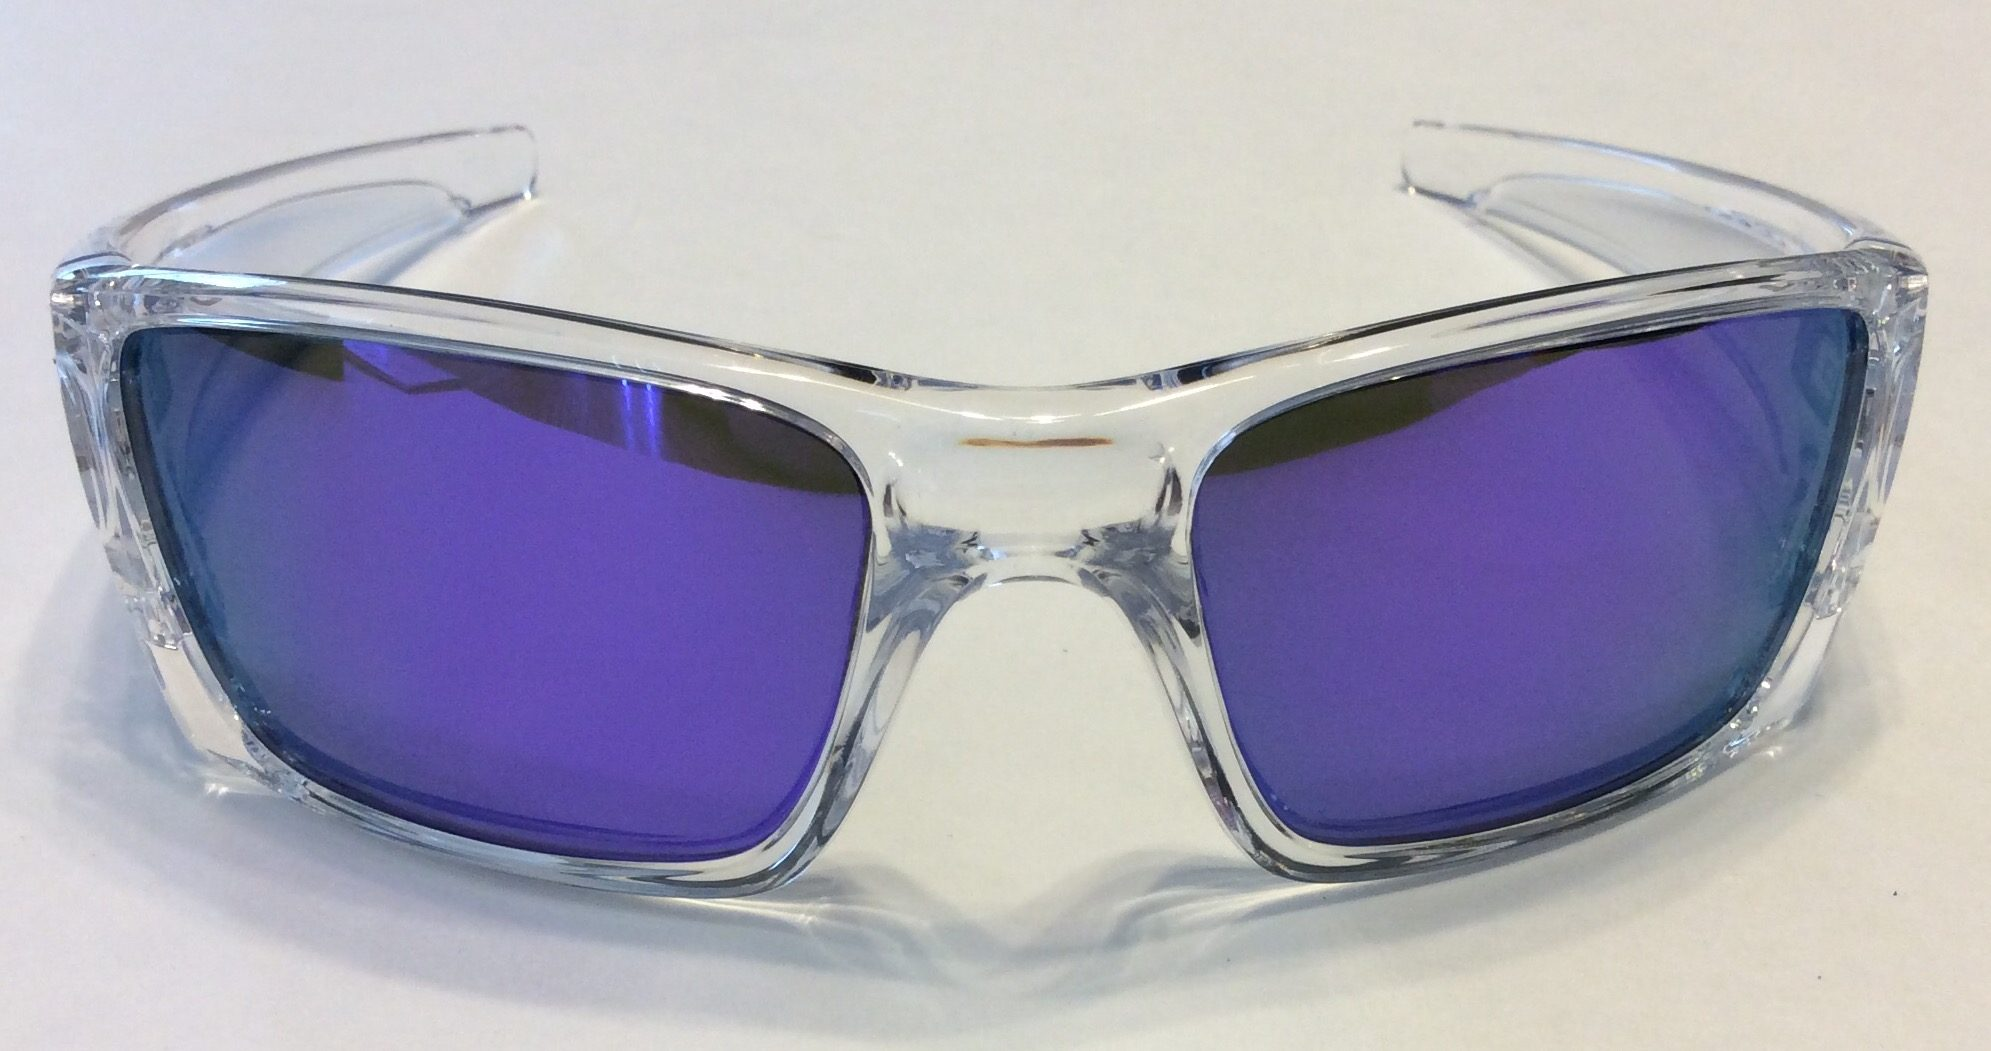 oakley sunglasses stockists manchester